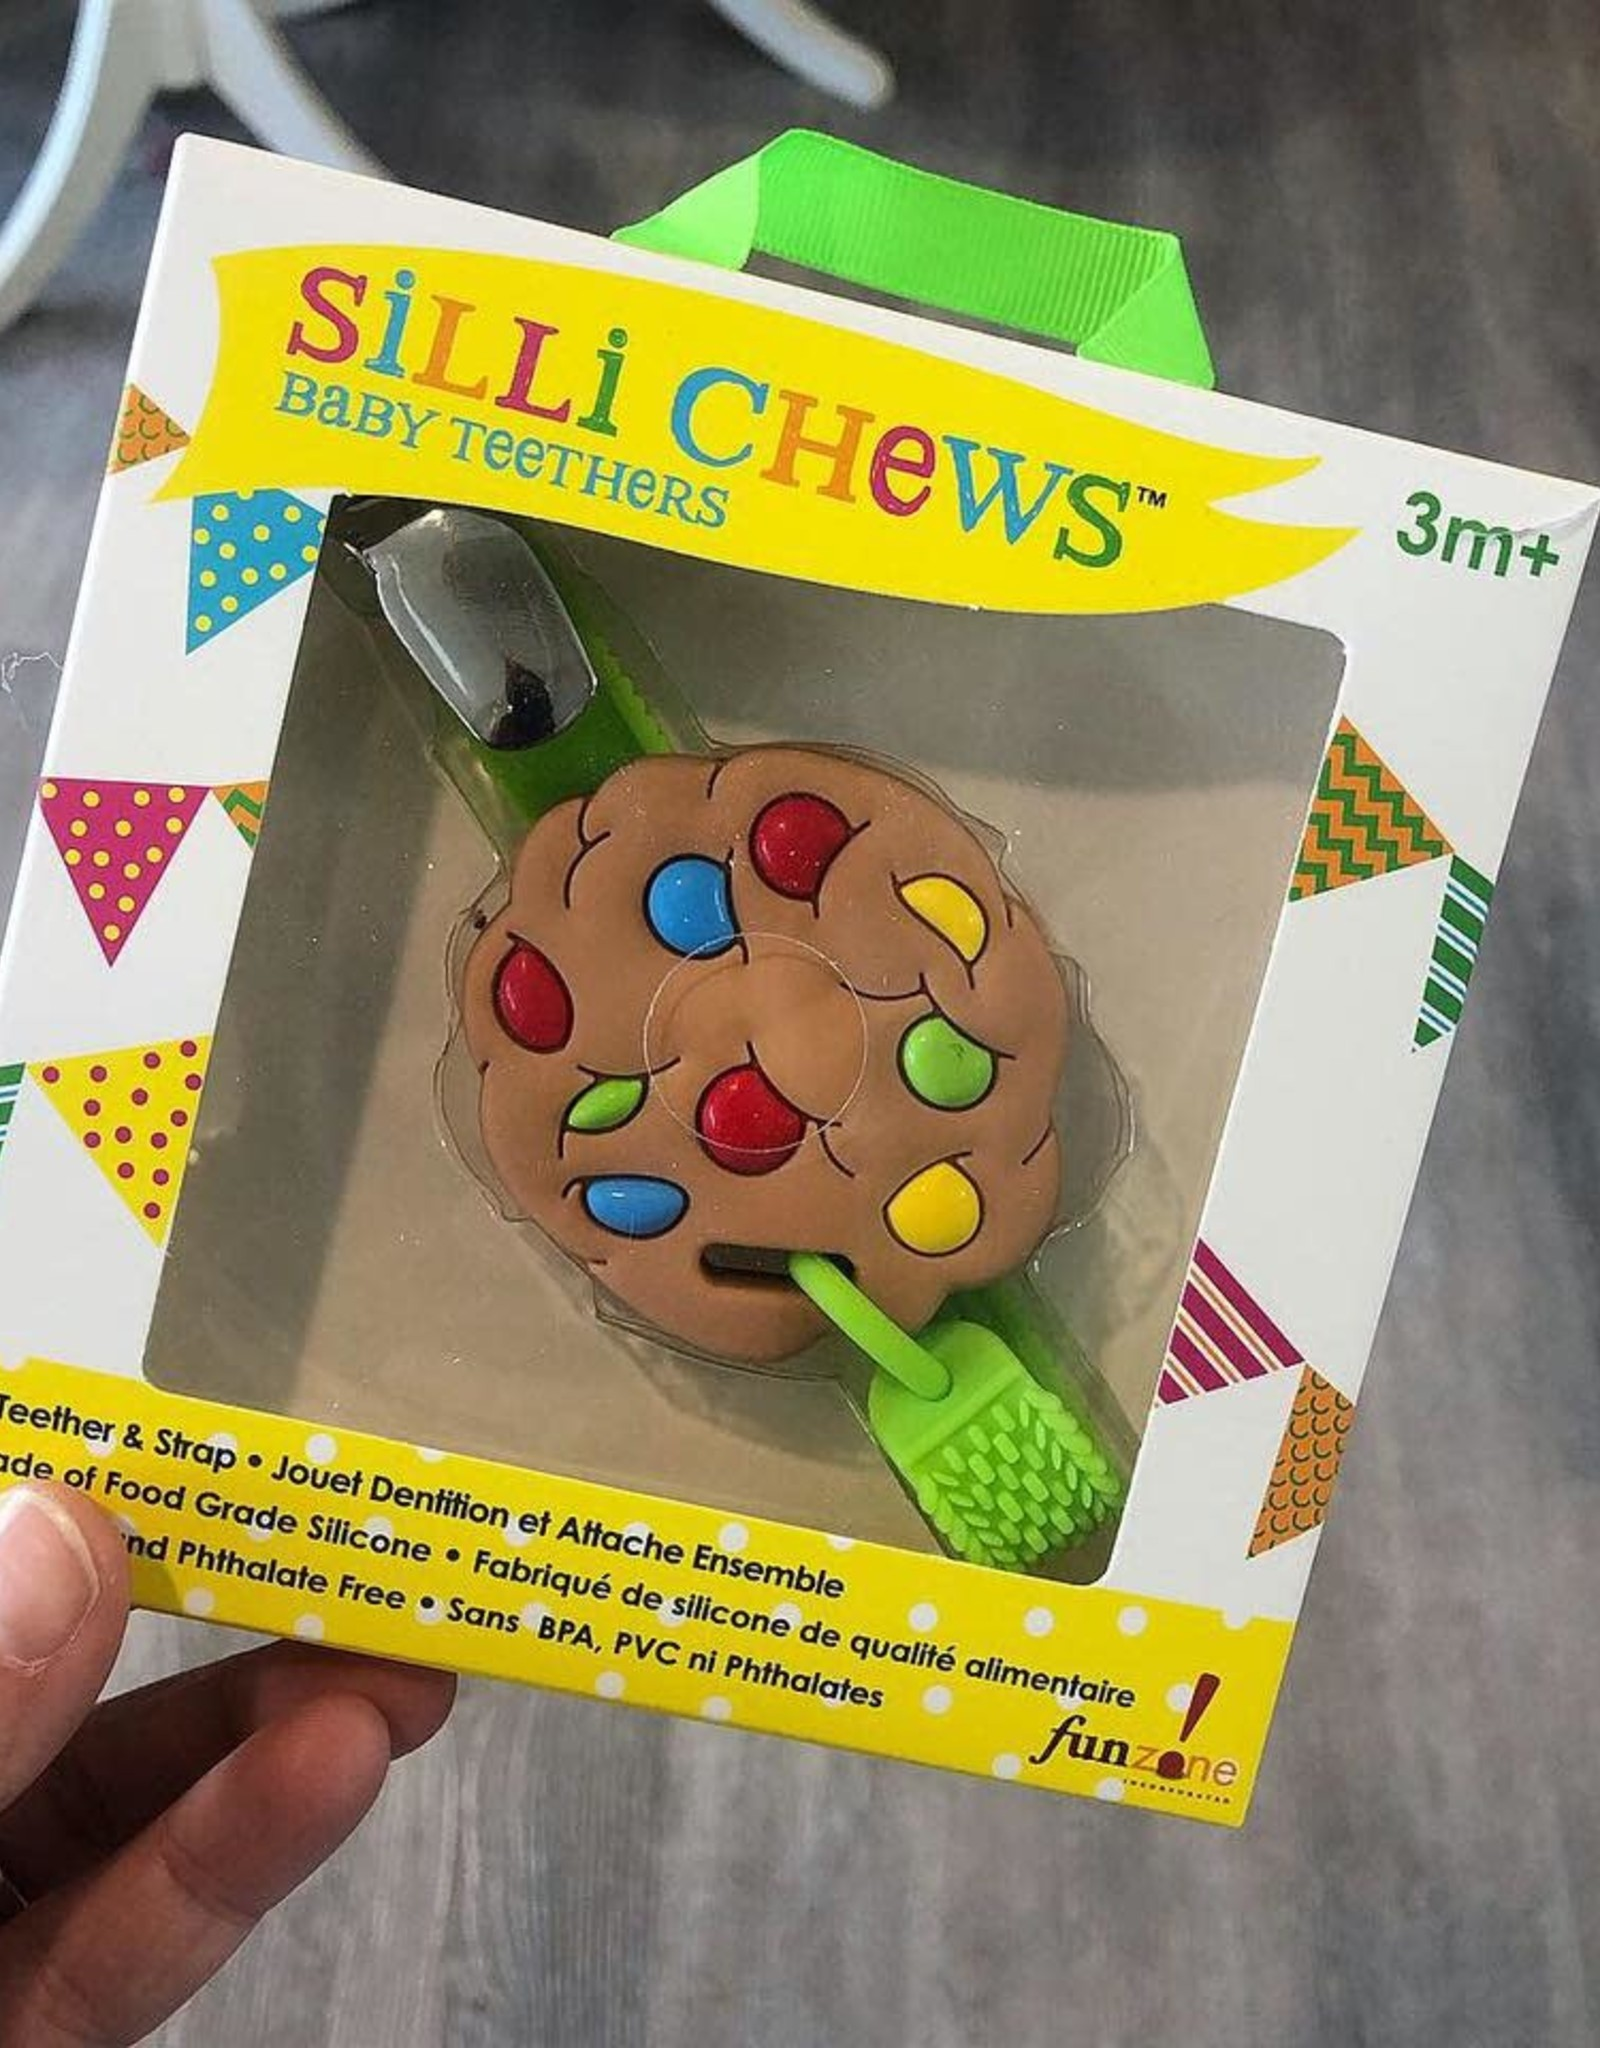 SilliChews Mini Cookie Teether with Strap